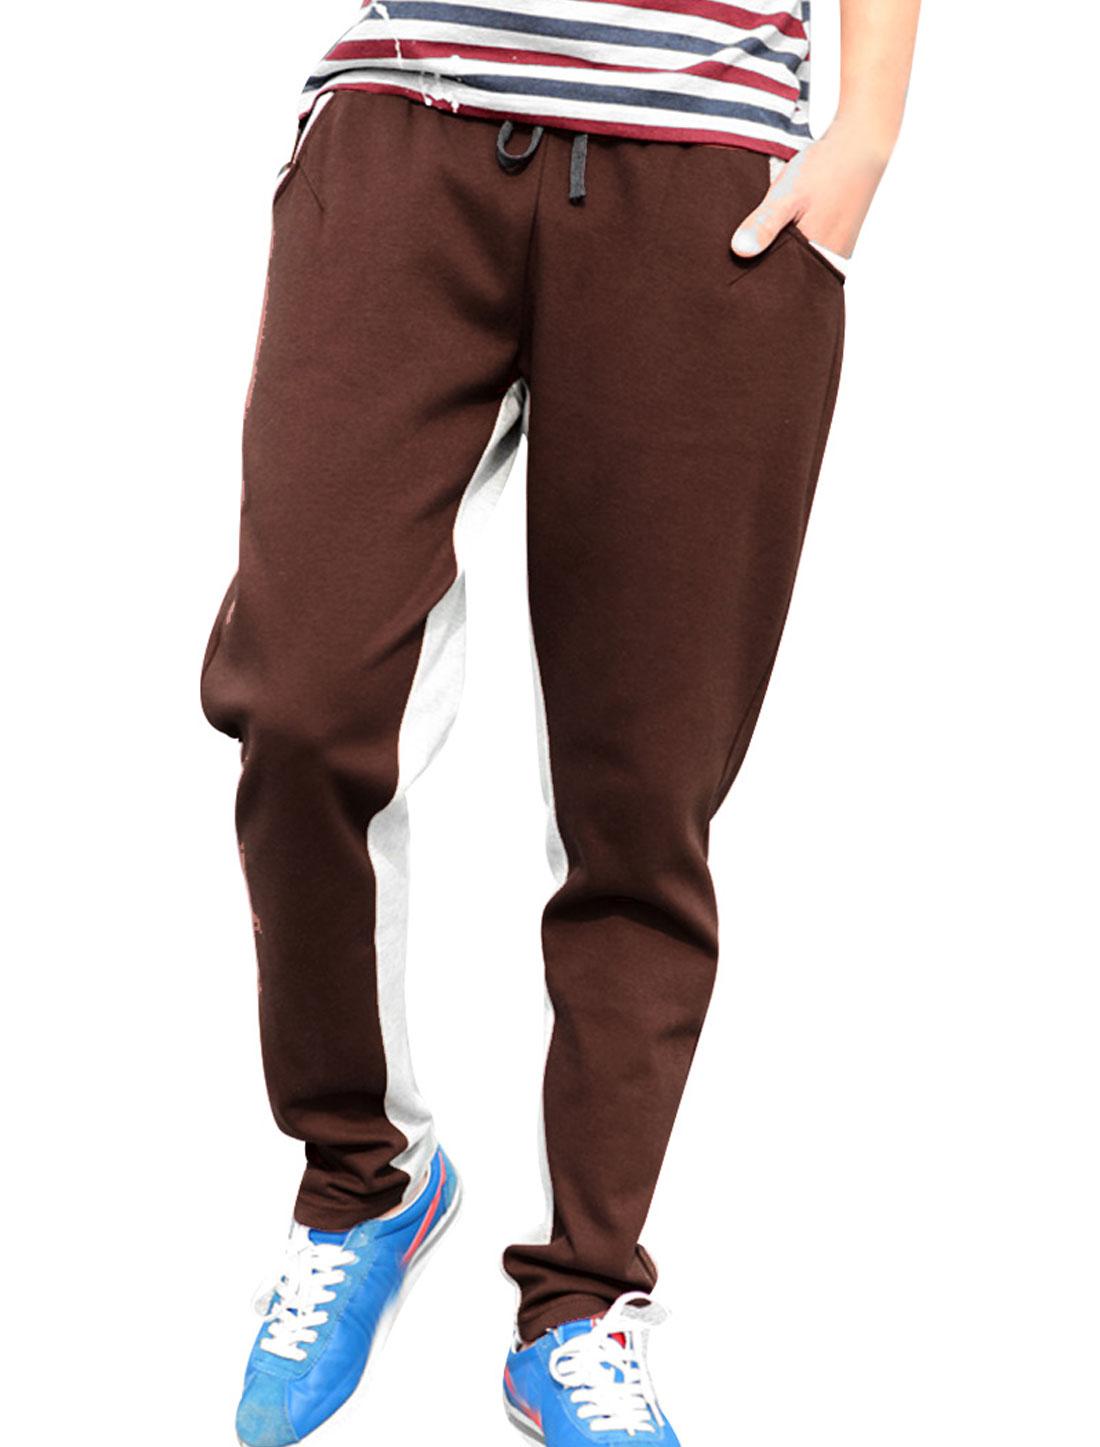 Azzuro Contrast Color Coffee Color Light Gray New Fashion Mens Elastic Waist Pants W30